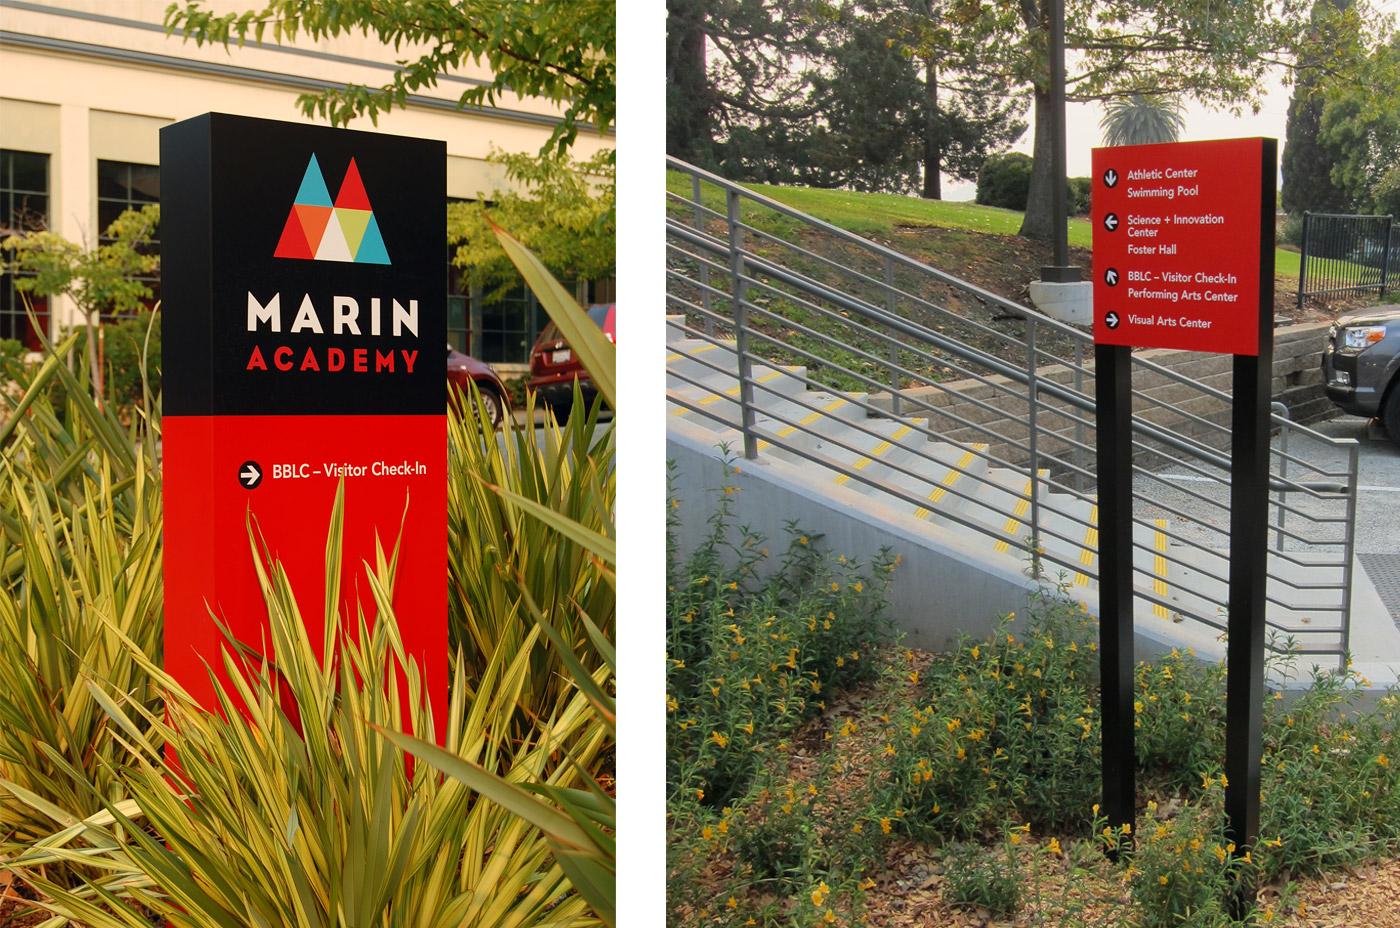 Marin Academy Wayfinding Signs